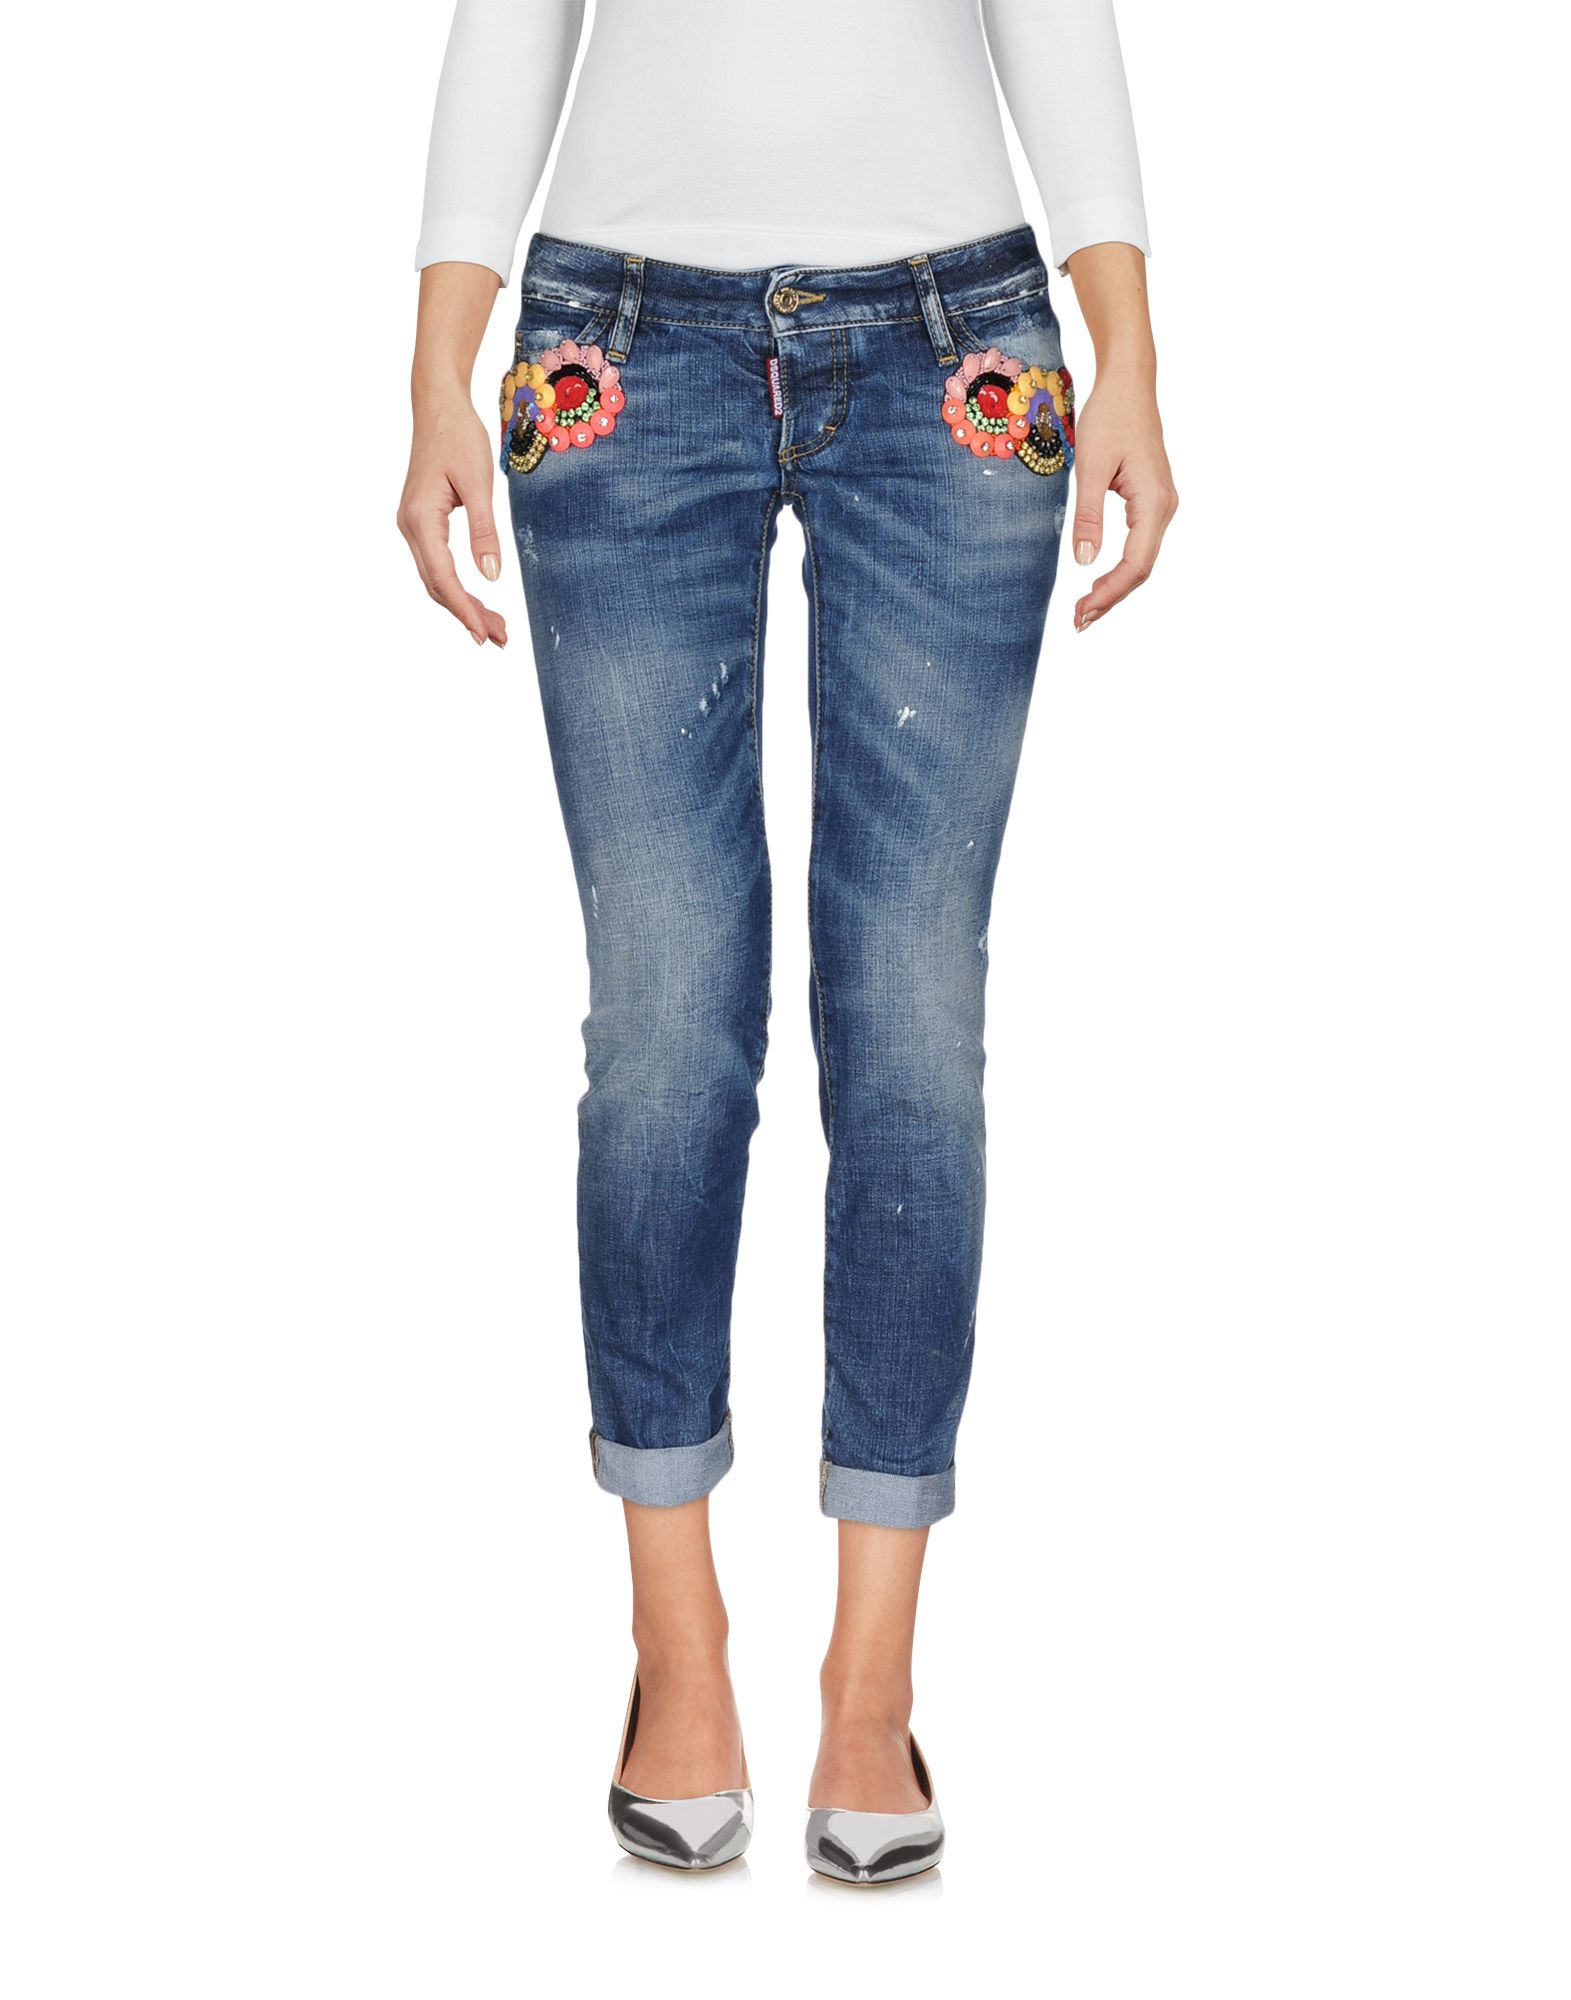 Pantaloni Jeans Dsquared2 Donna - Acquista online su Qeriob9